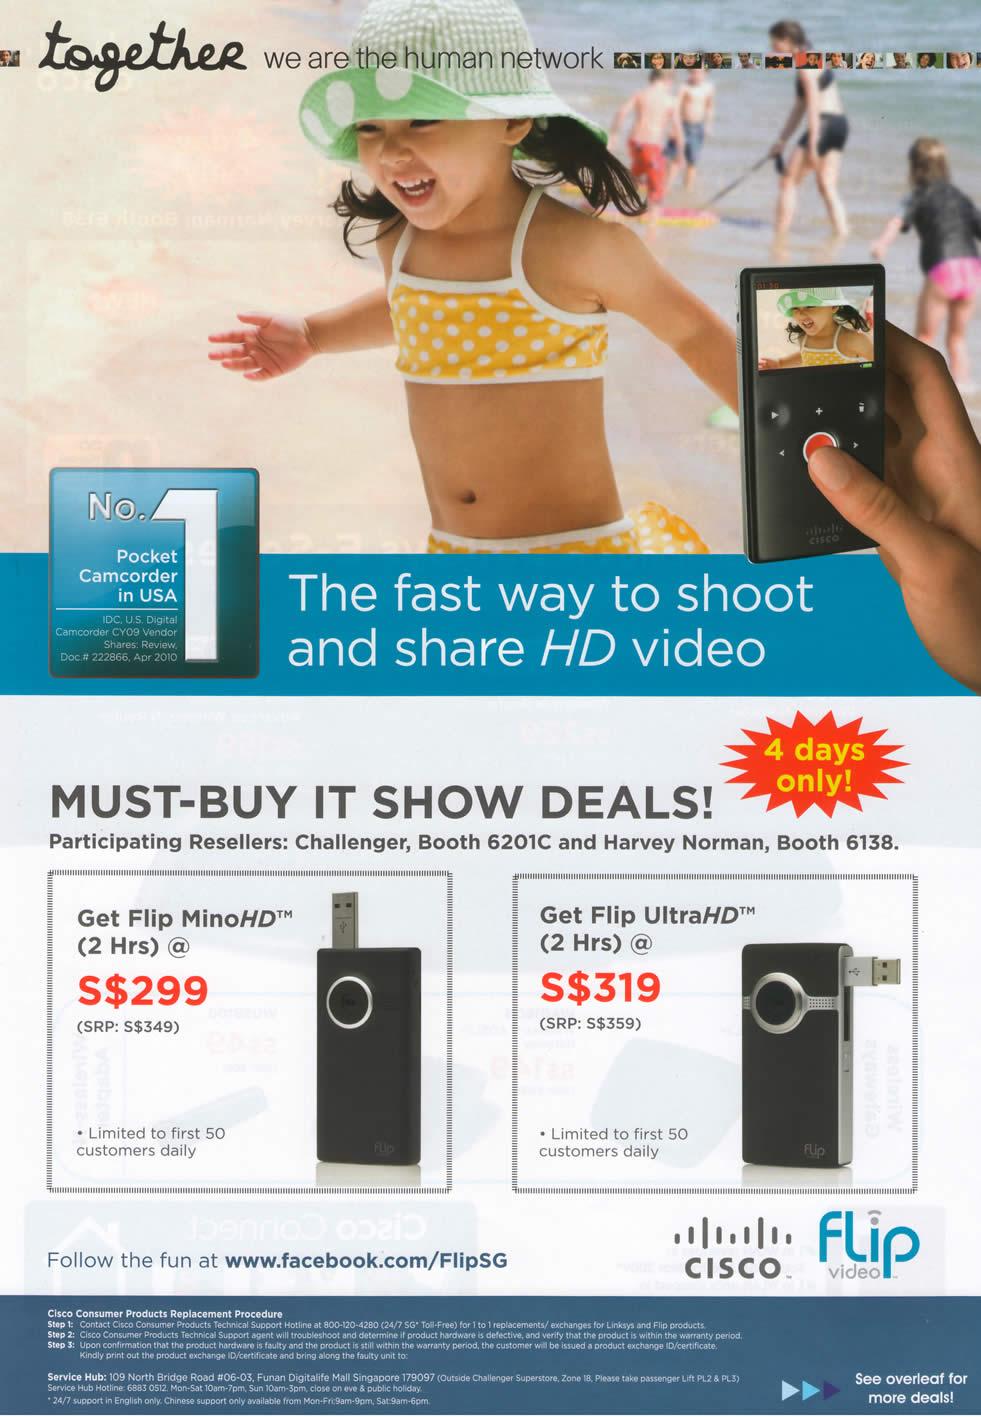 IT Show 2011 price list image brochure of Cisco Flip MinoHD UltraHD Challenger Harvey Norman